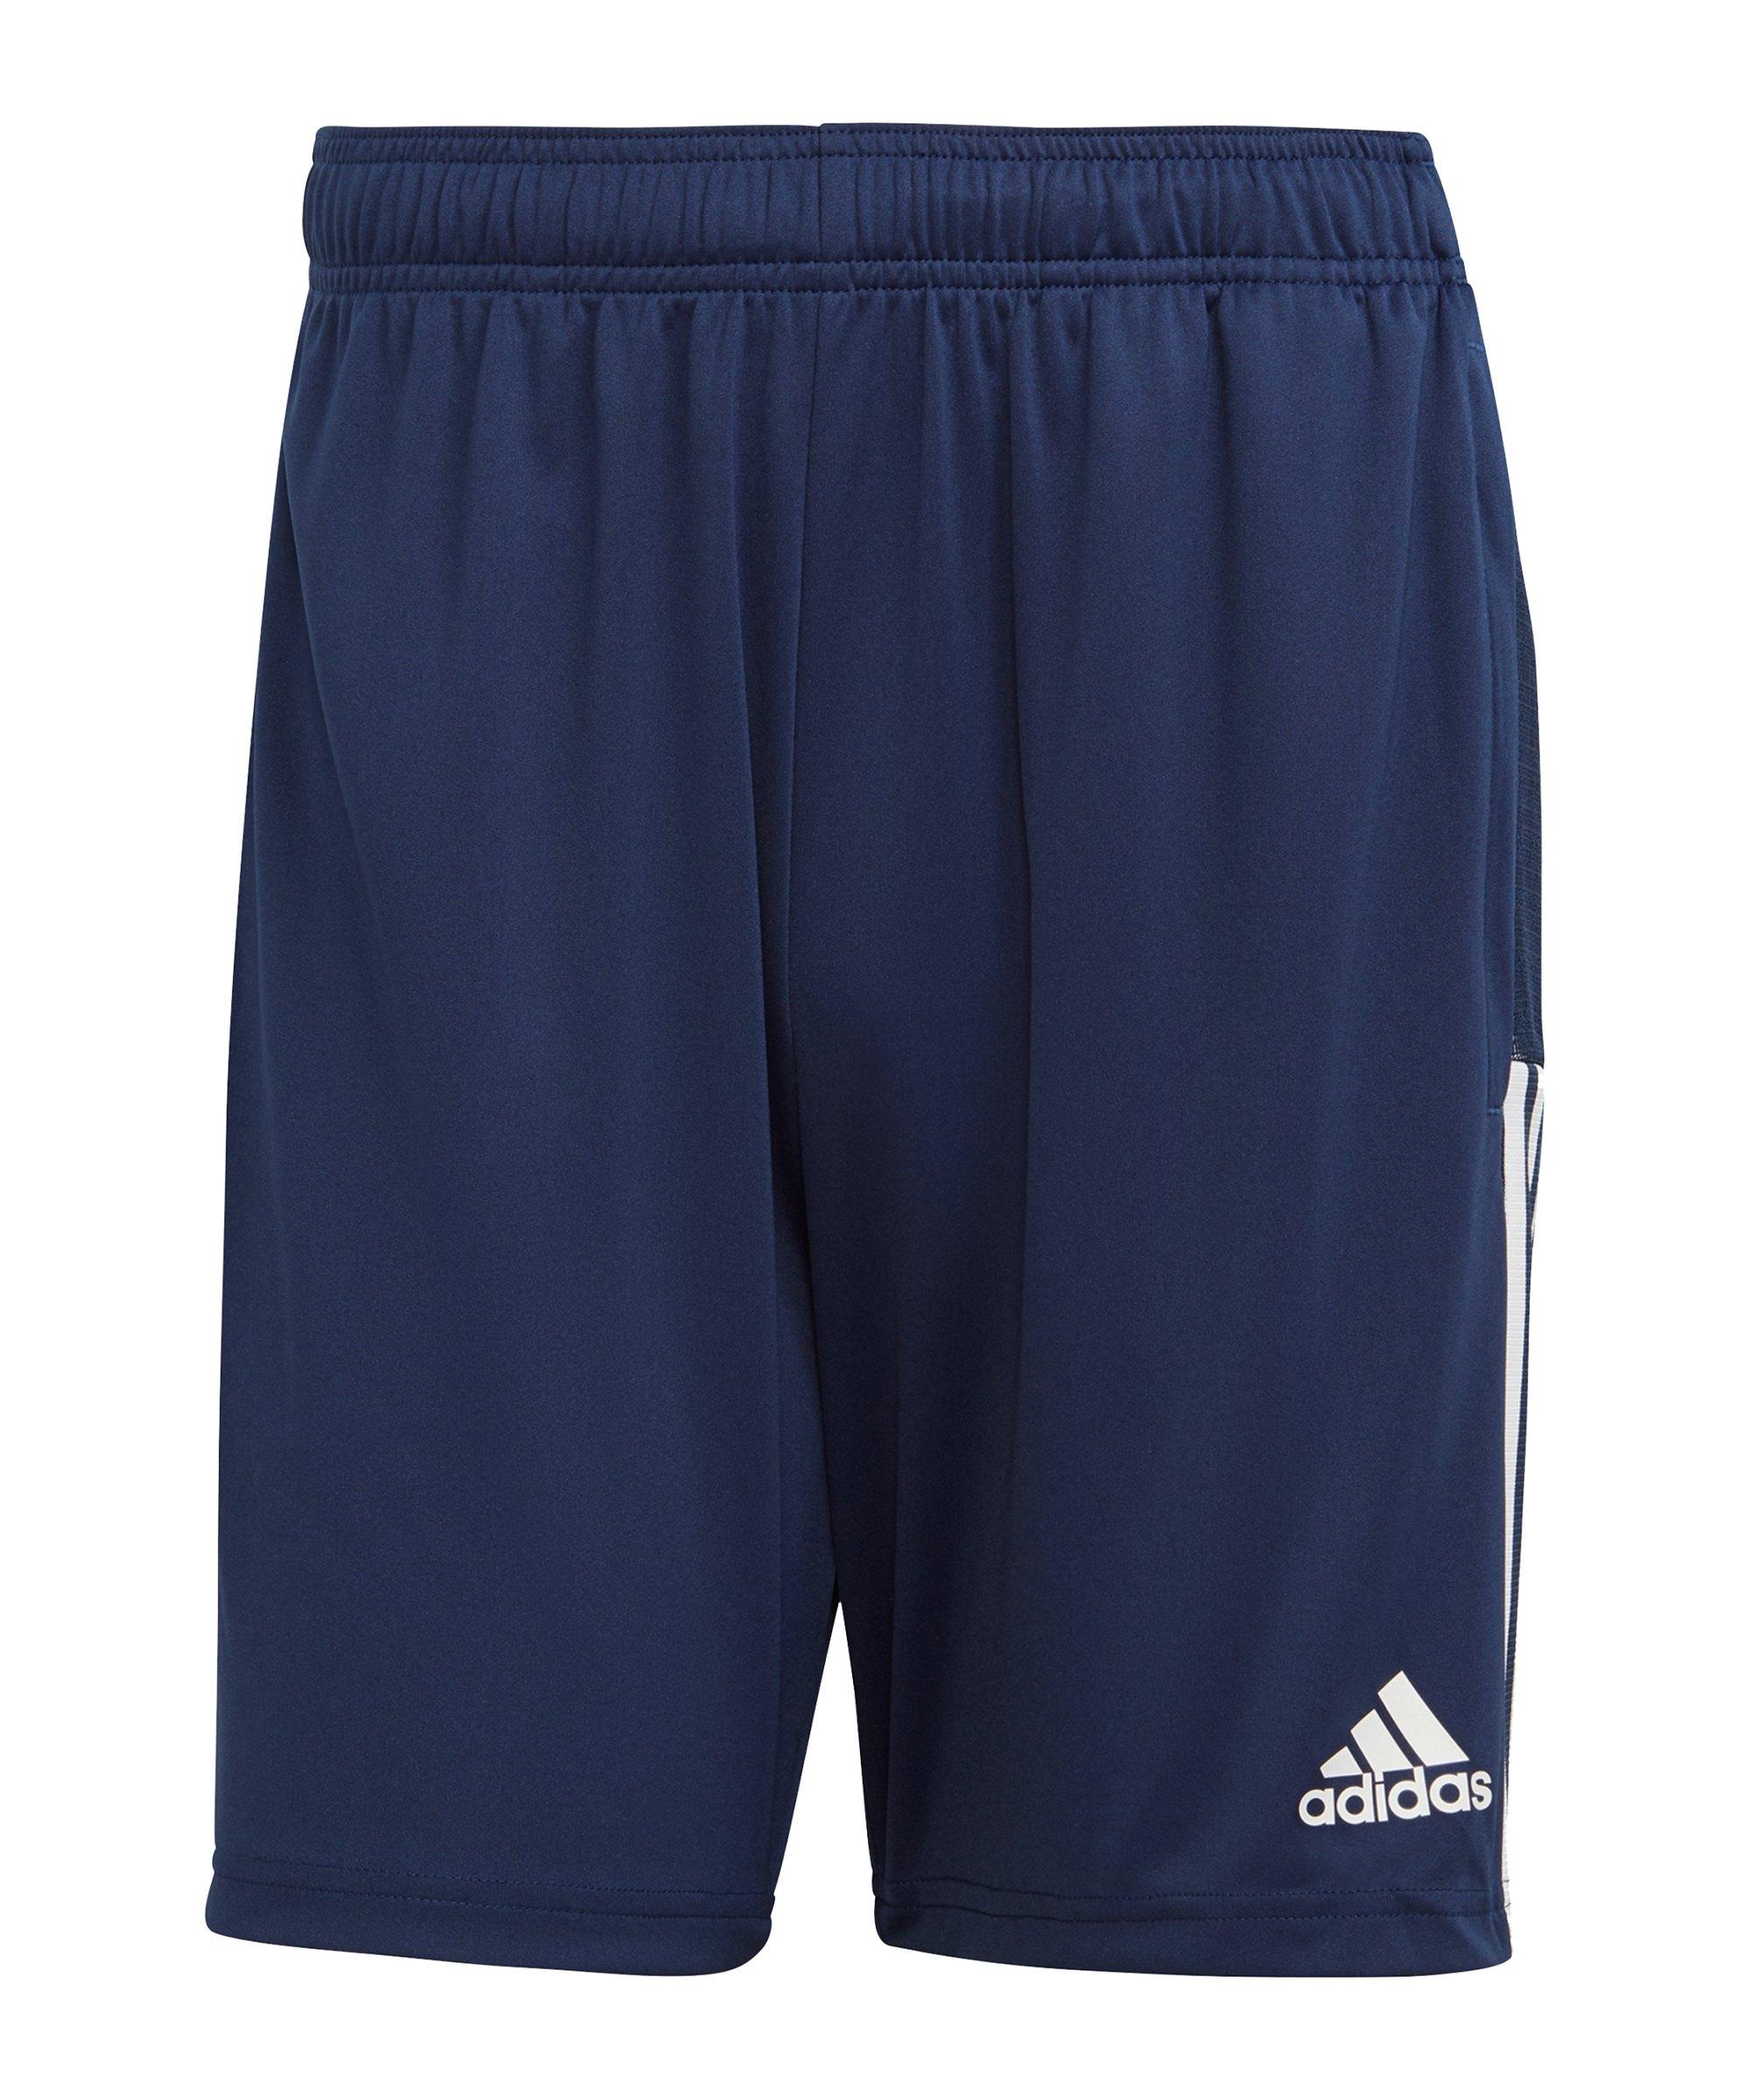 adidas Tiro 21 Short Dunkelblau - blau